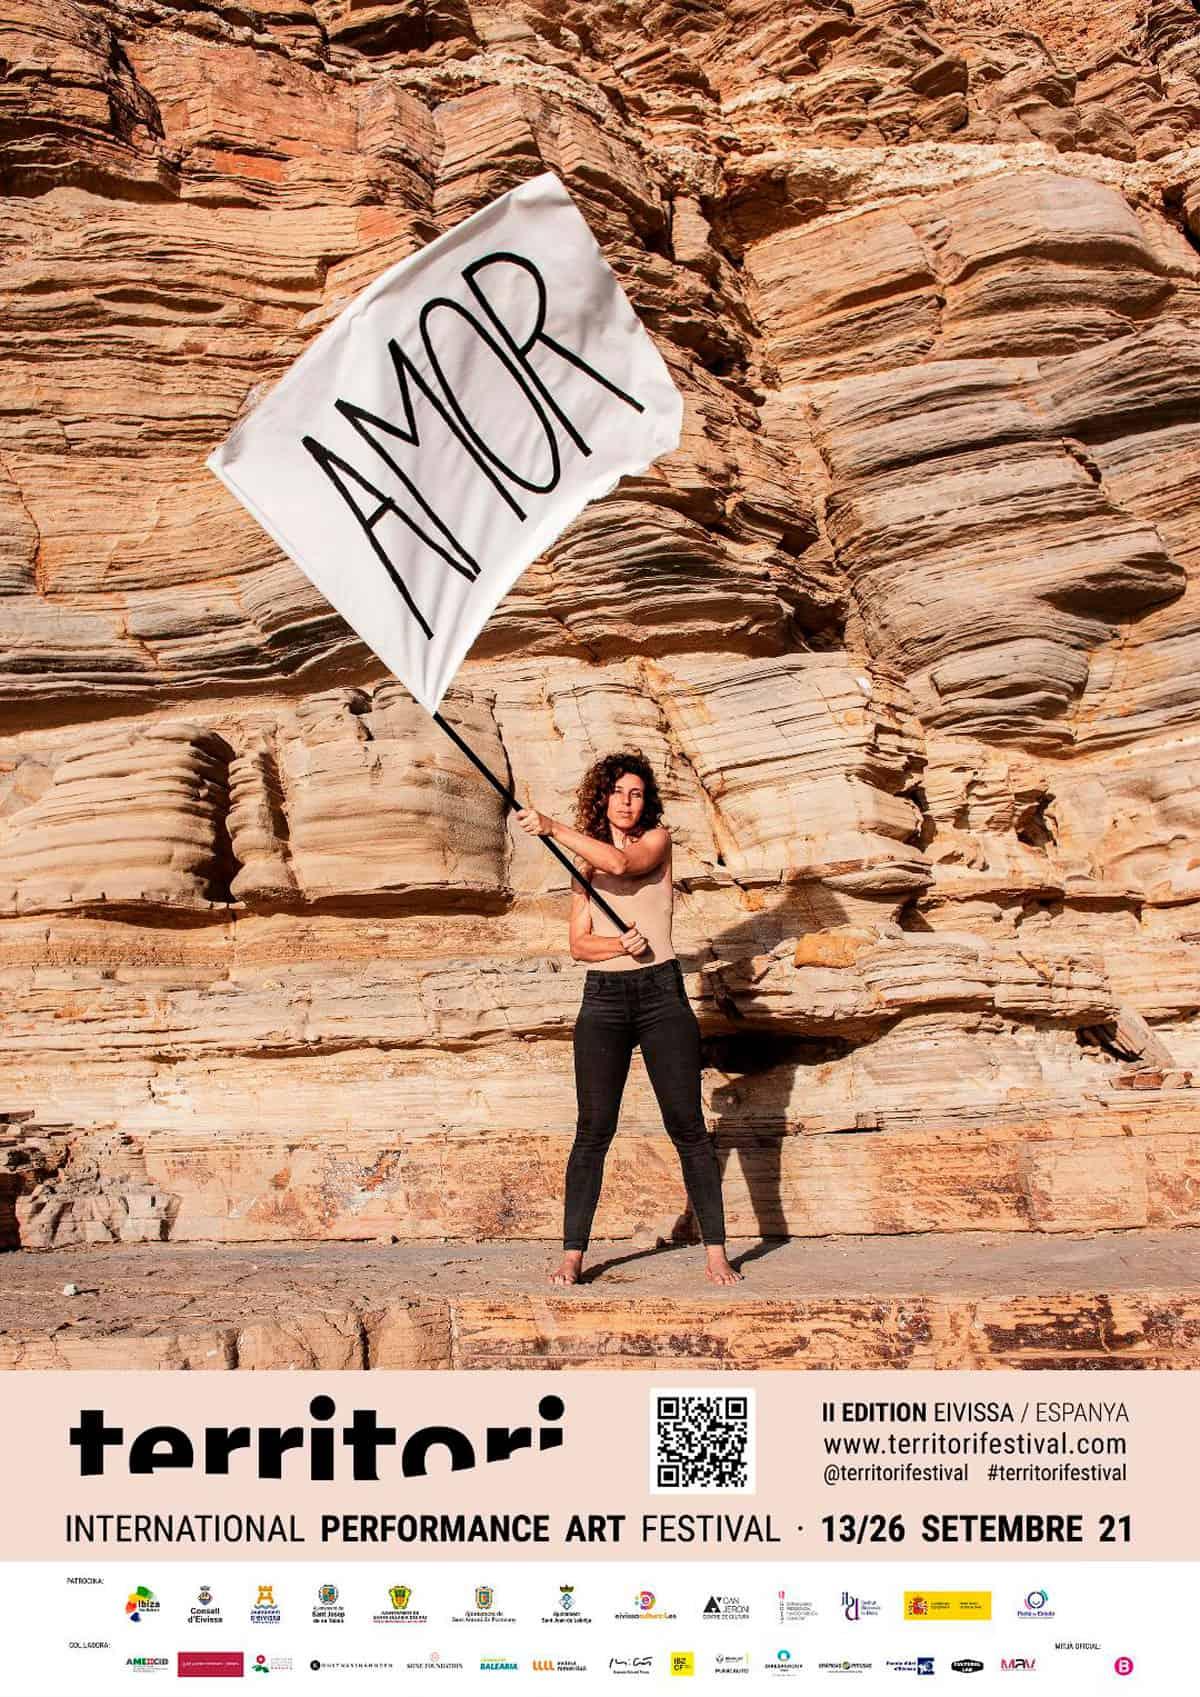 territori-international-performance-art-festival-Eivissa-2021-welcometoibiza